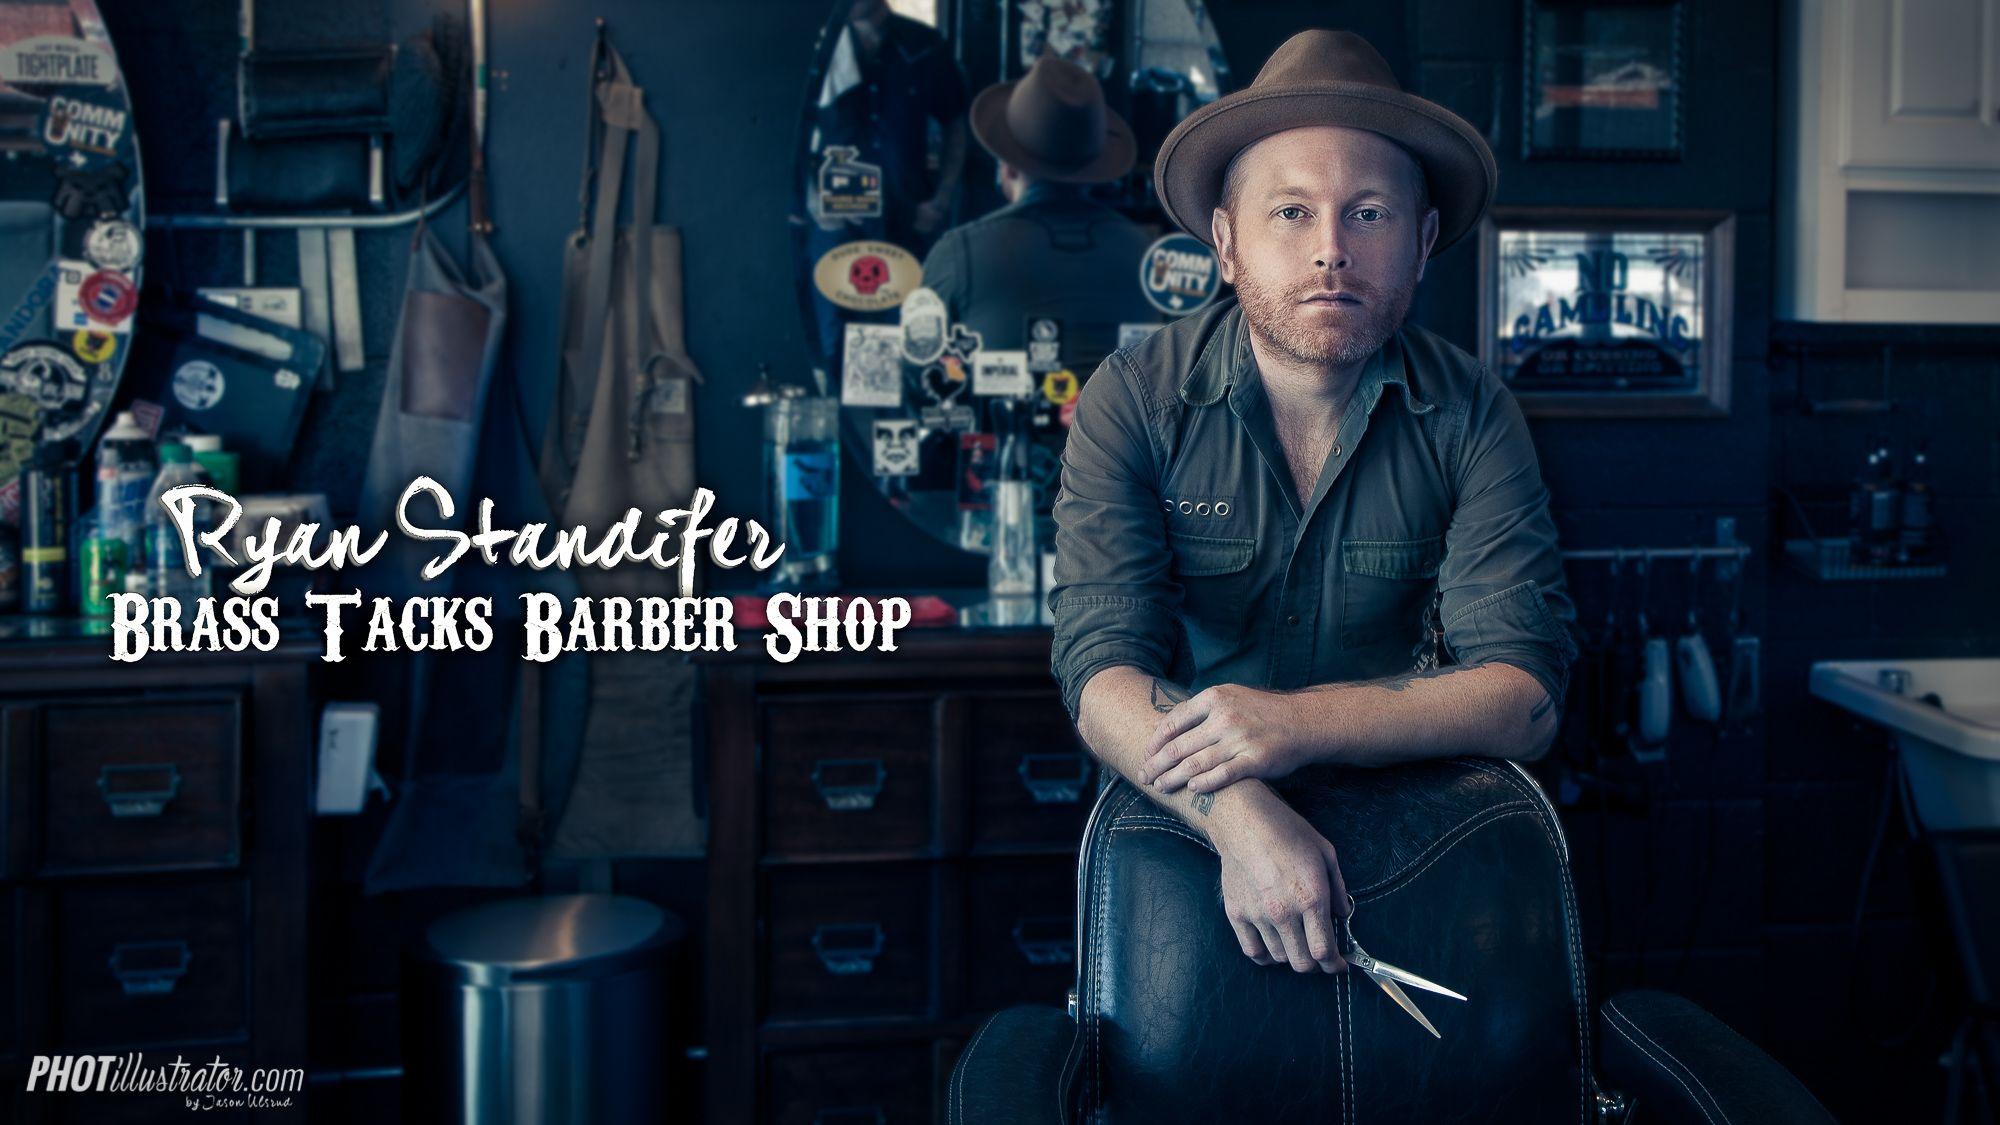 Ryan Standifer Rocks Some Serious Scissors At Brass Tacks Barber Shop In Dallas Tx Barber Shop Editorial Portrait Dallas Photographers